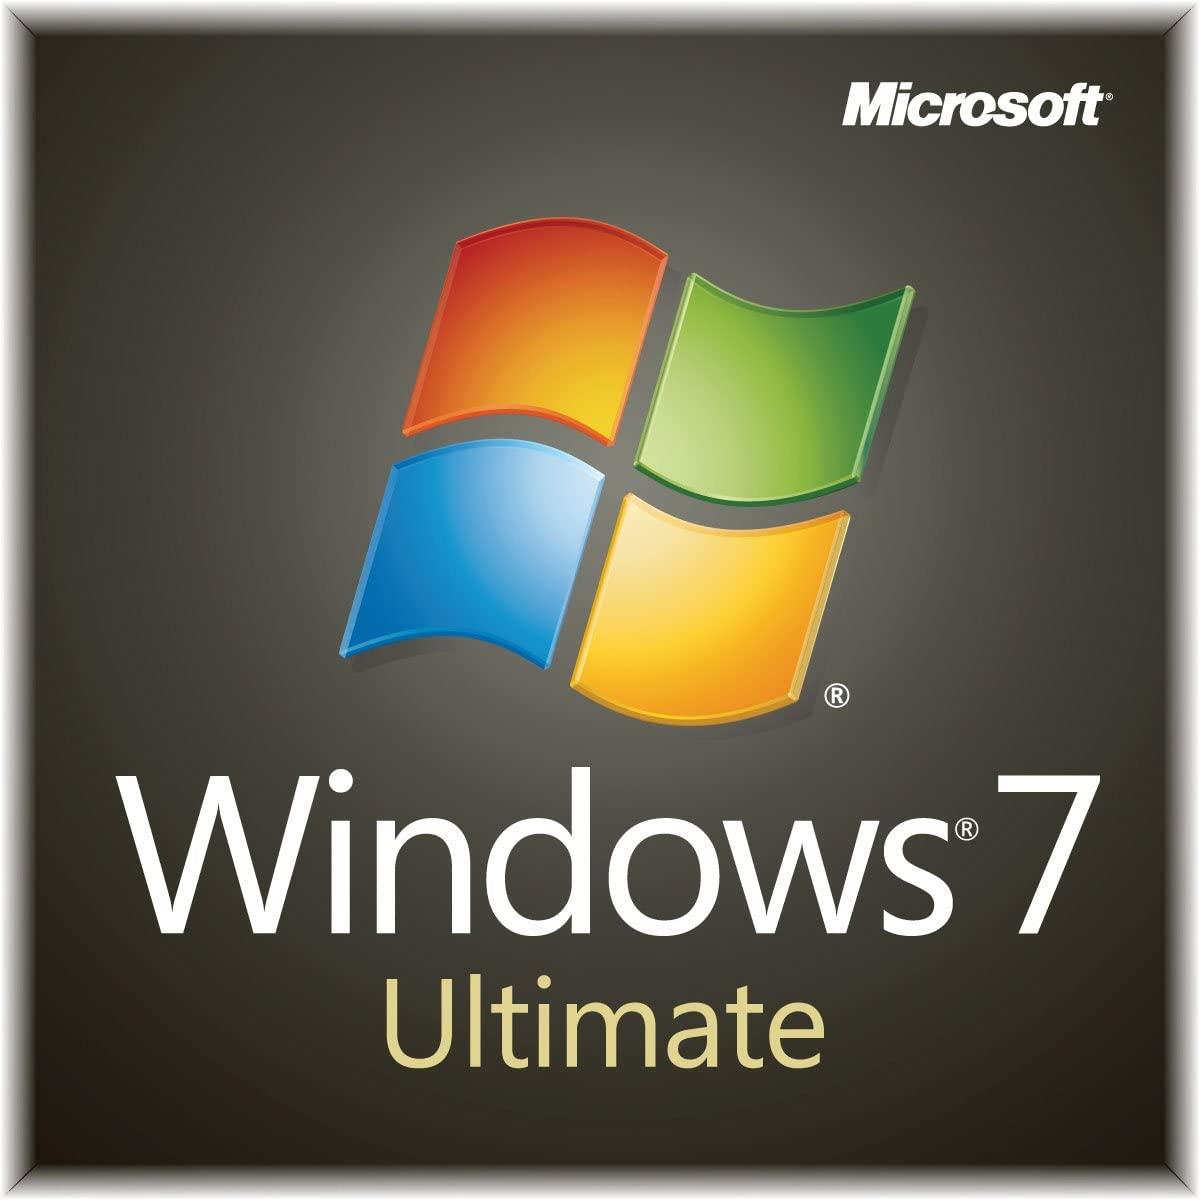 Windows 7 Ultimate SP1 64bit (Full) System Builder OEM DVD 1 Pack [Old Packaging]